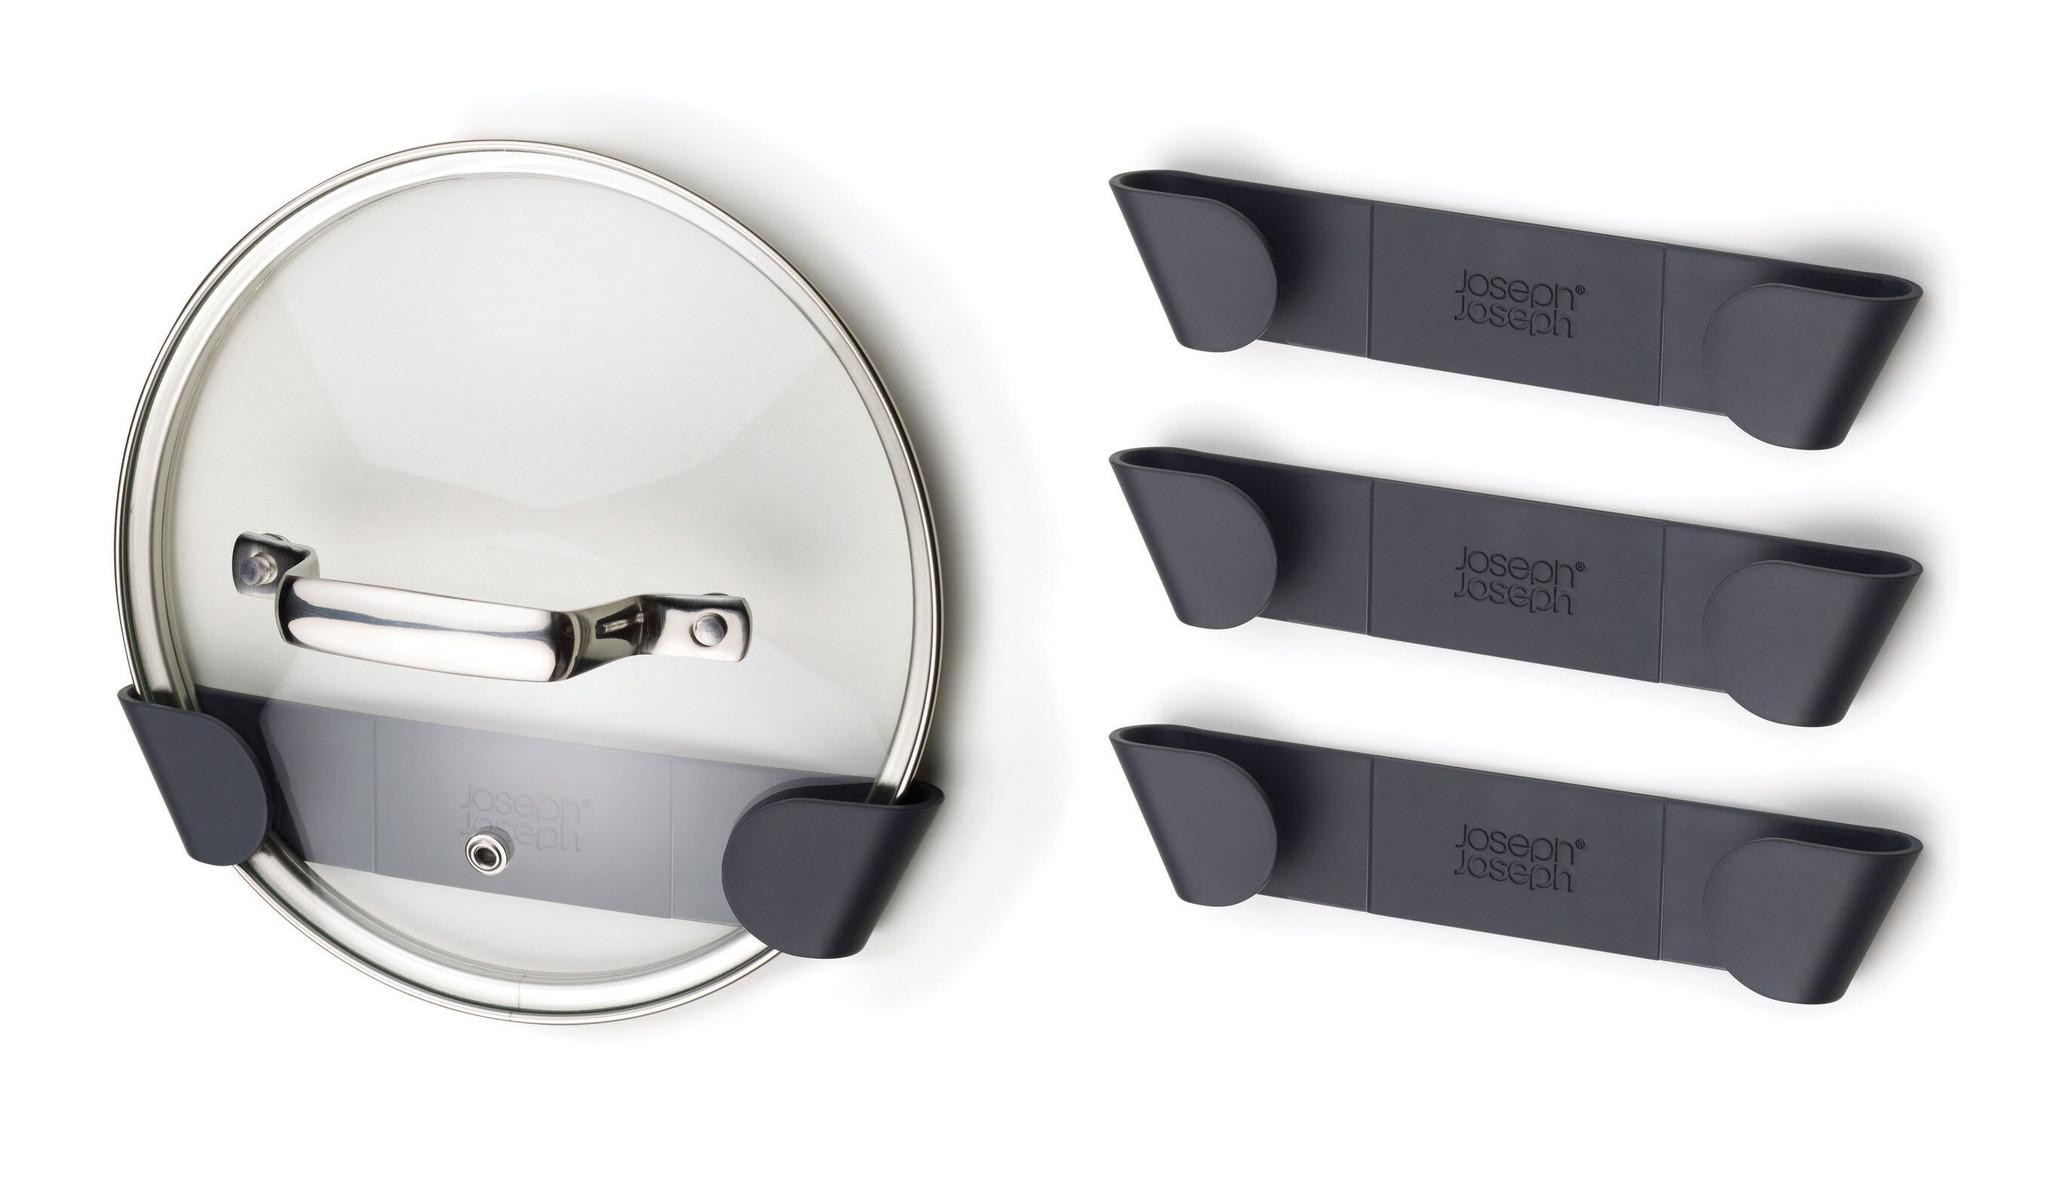 JosephJoseph CupboardStore- set 4 pan lid holders